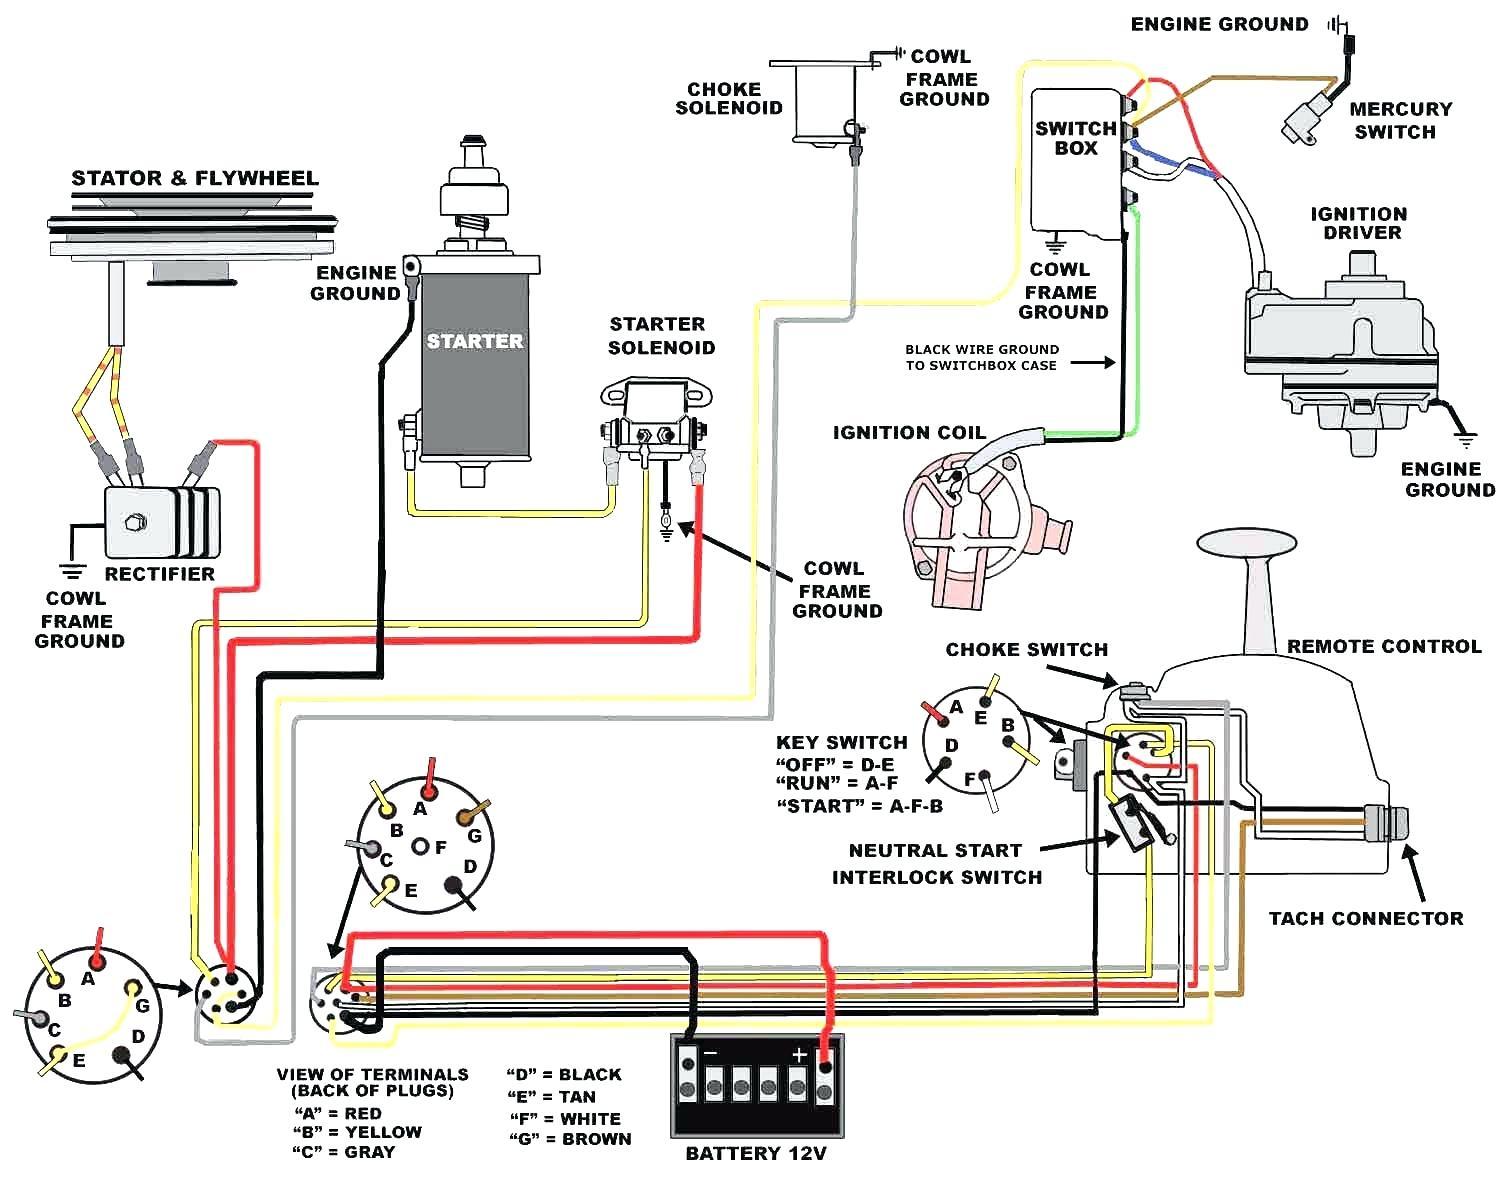 Ignition Key Switch Wiring Diagram | Wiring Diagram - Boat Ignition Switch Wiring Diagram